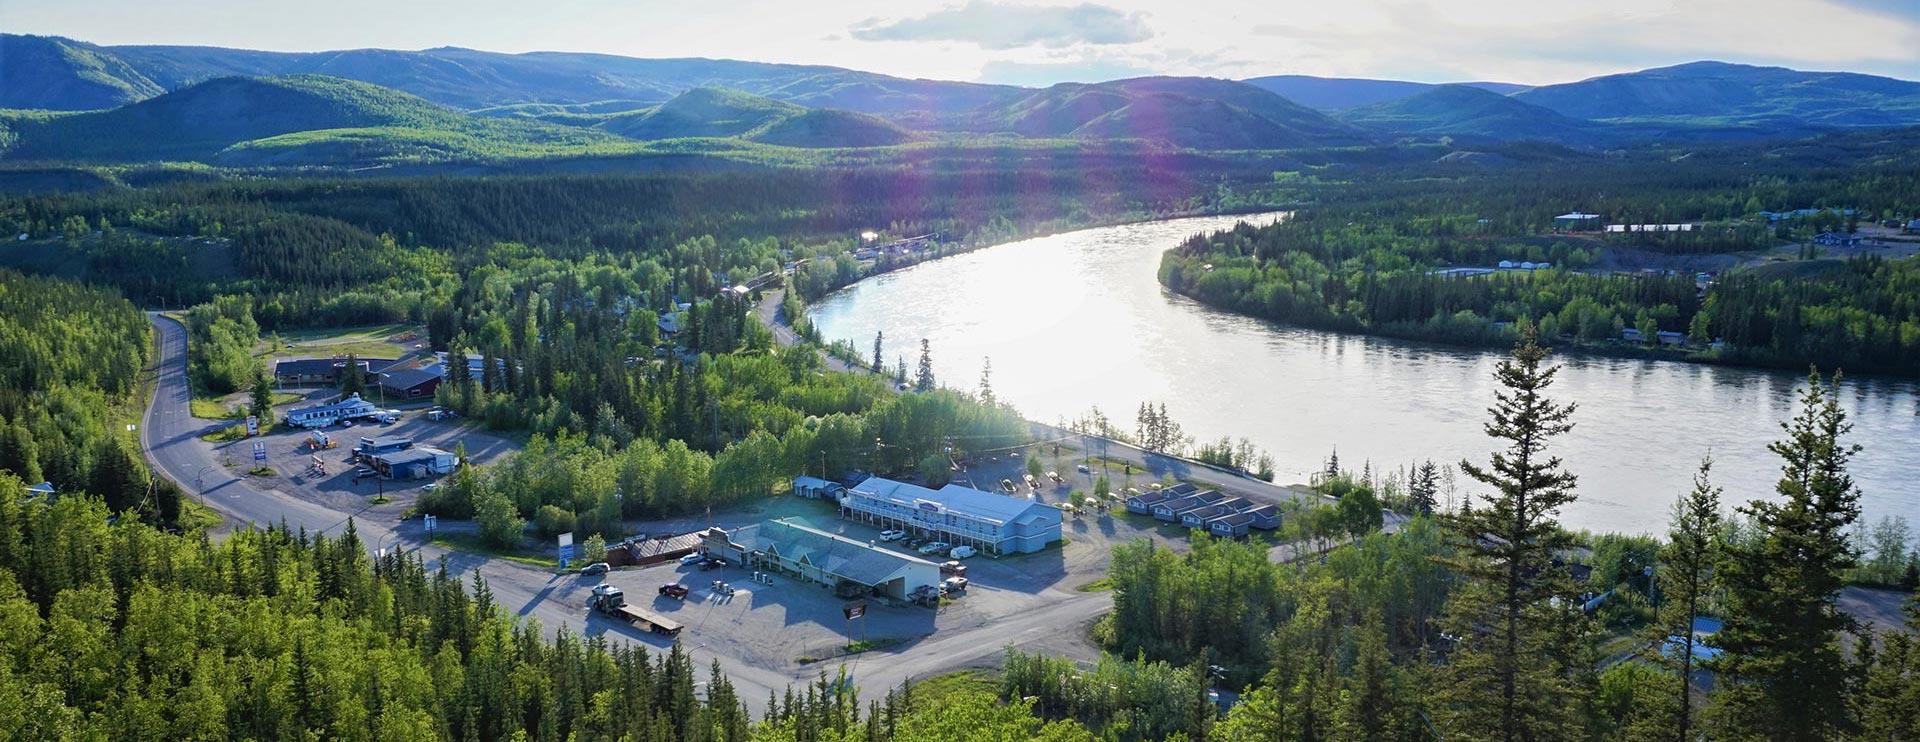 Carmacks Overview Photo, Yukon